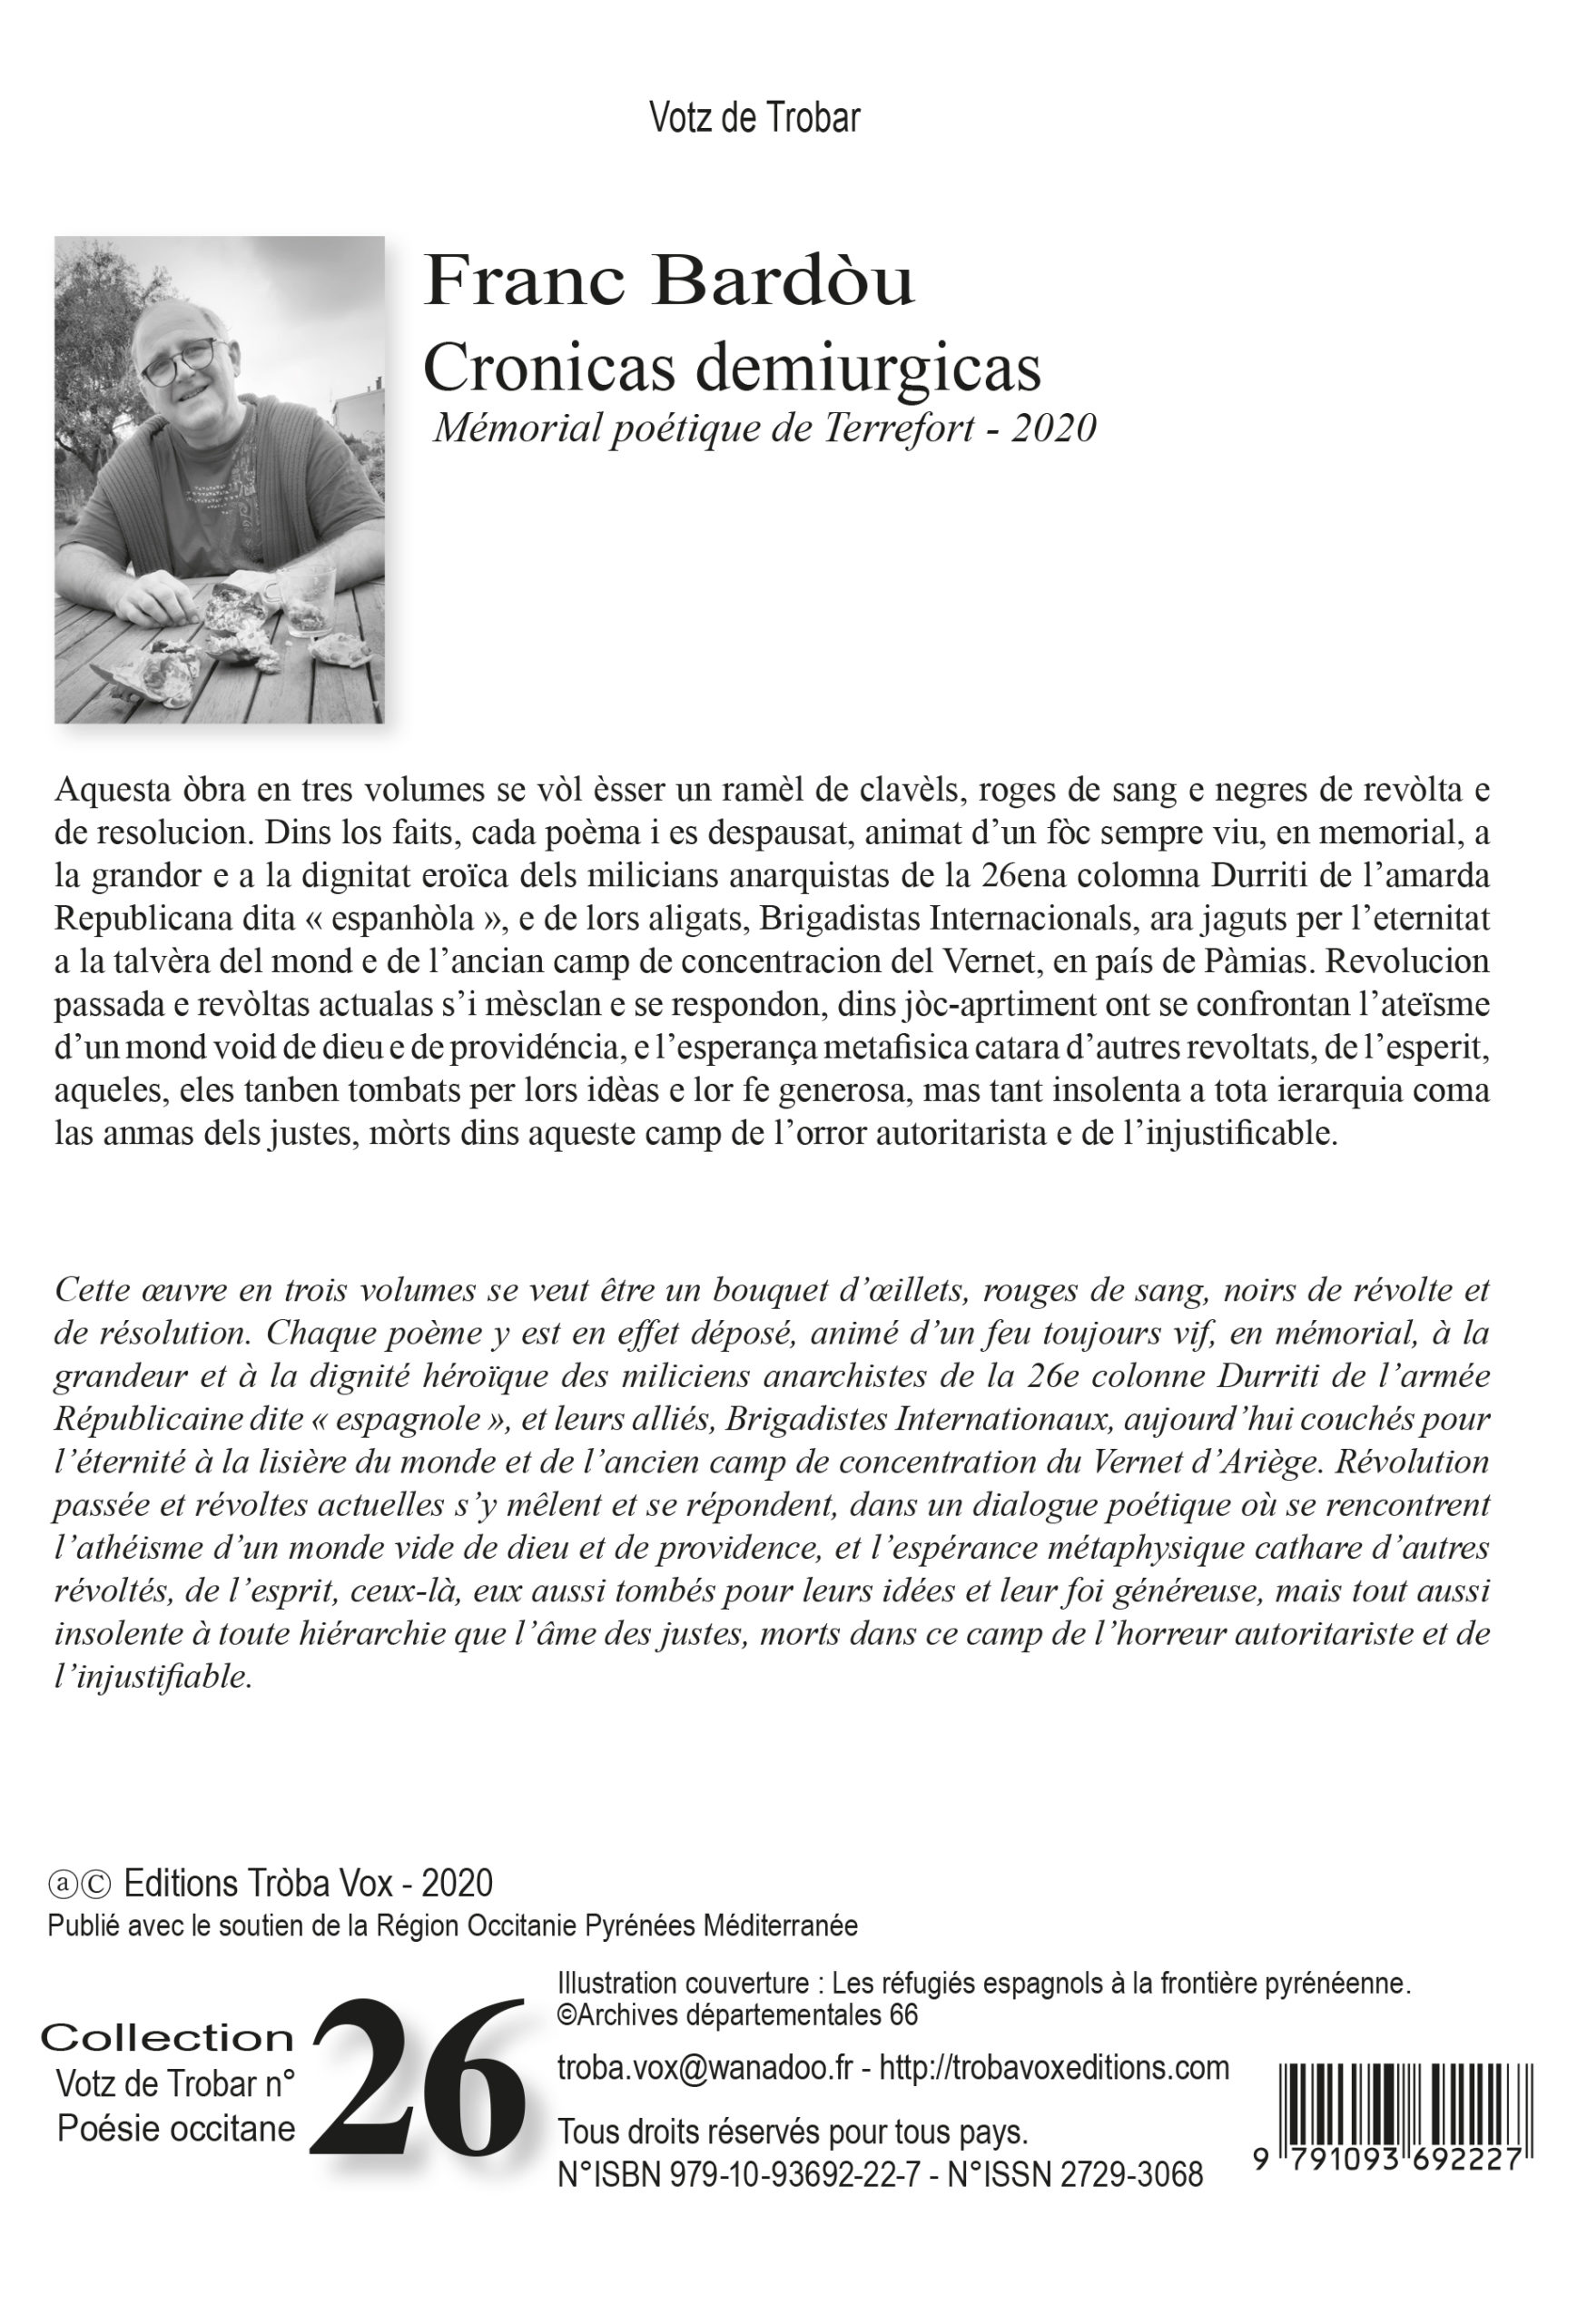 Cronicas 2